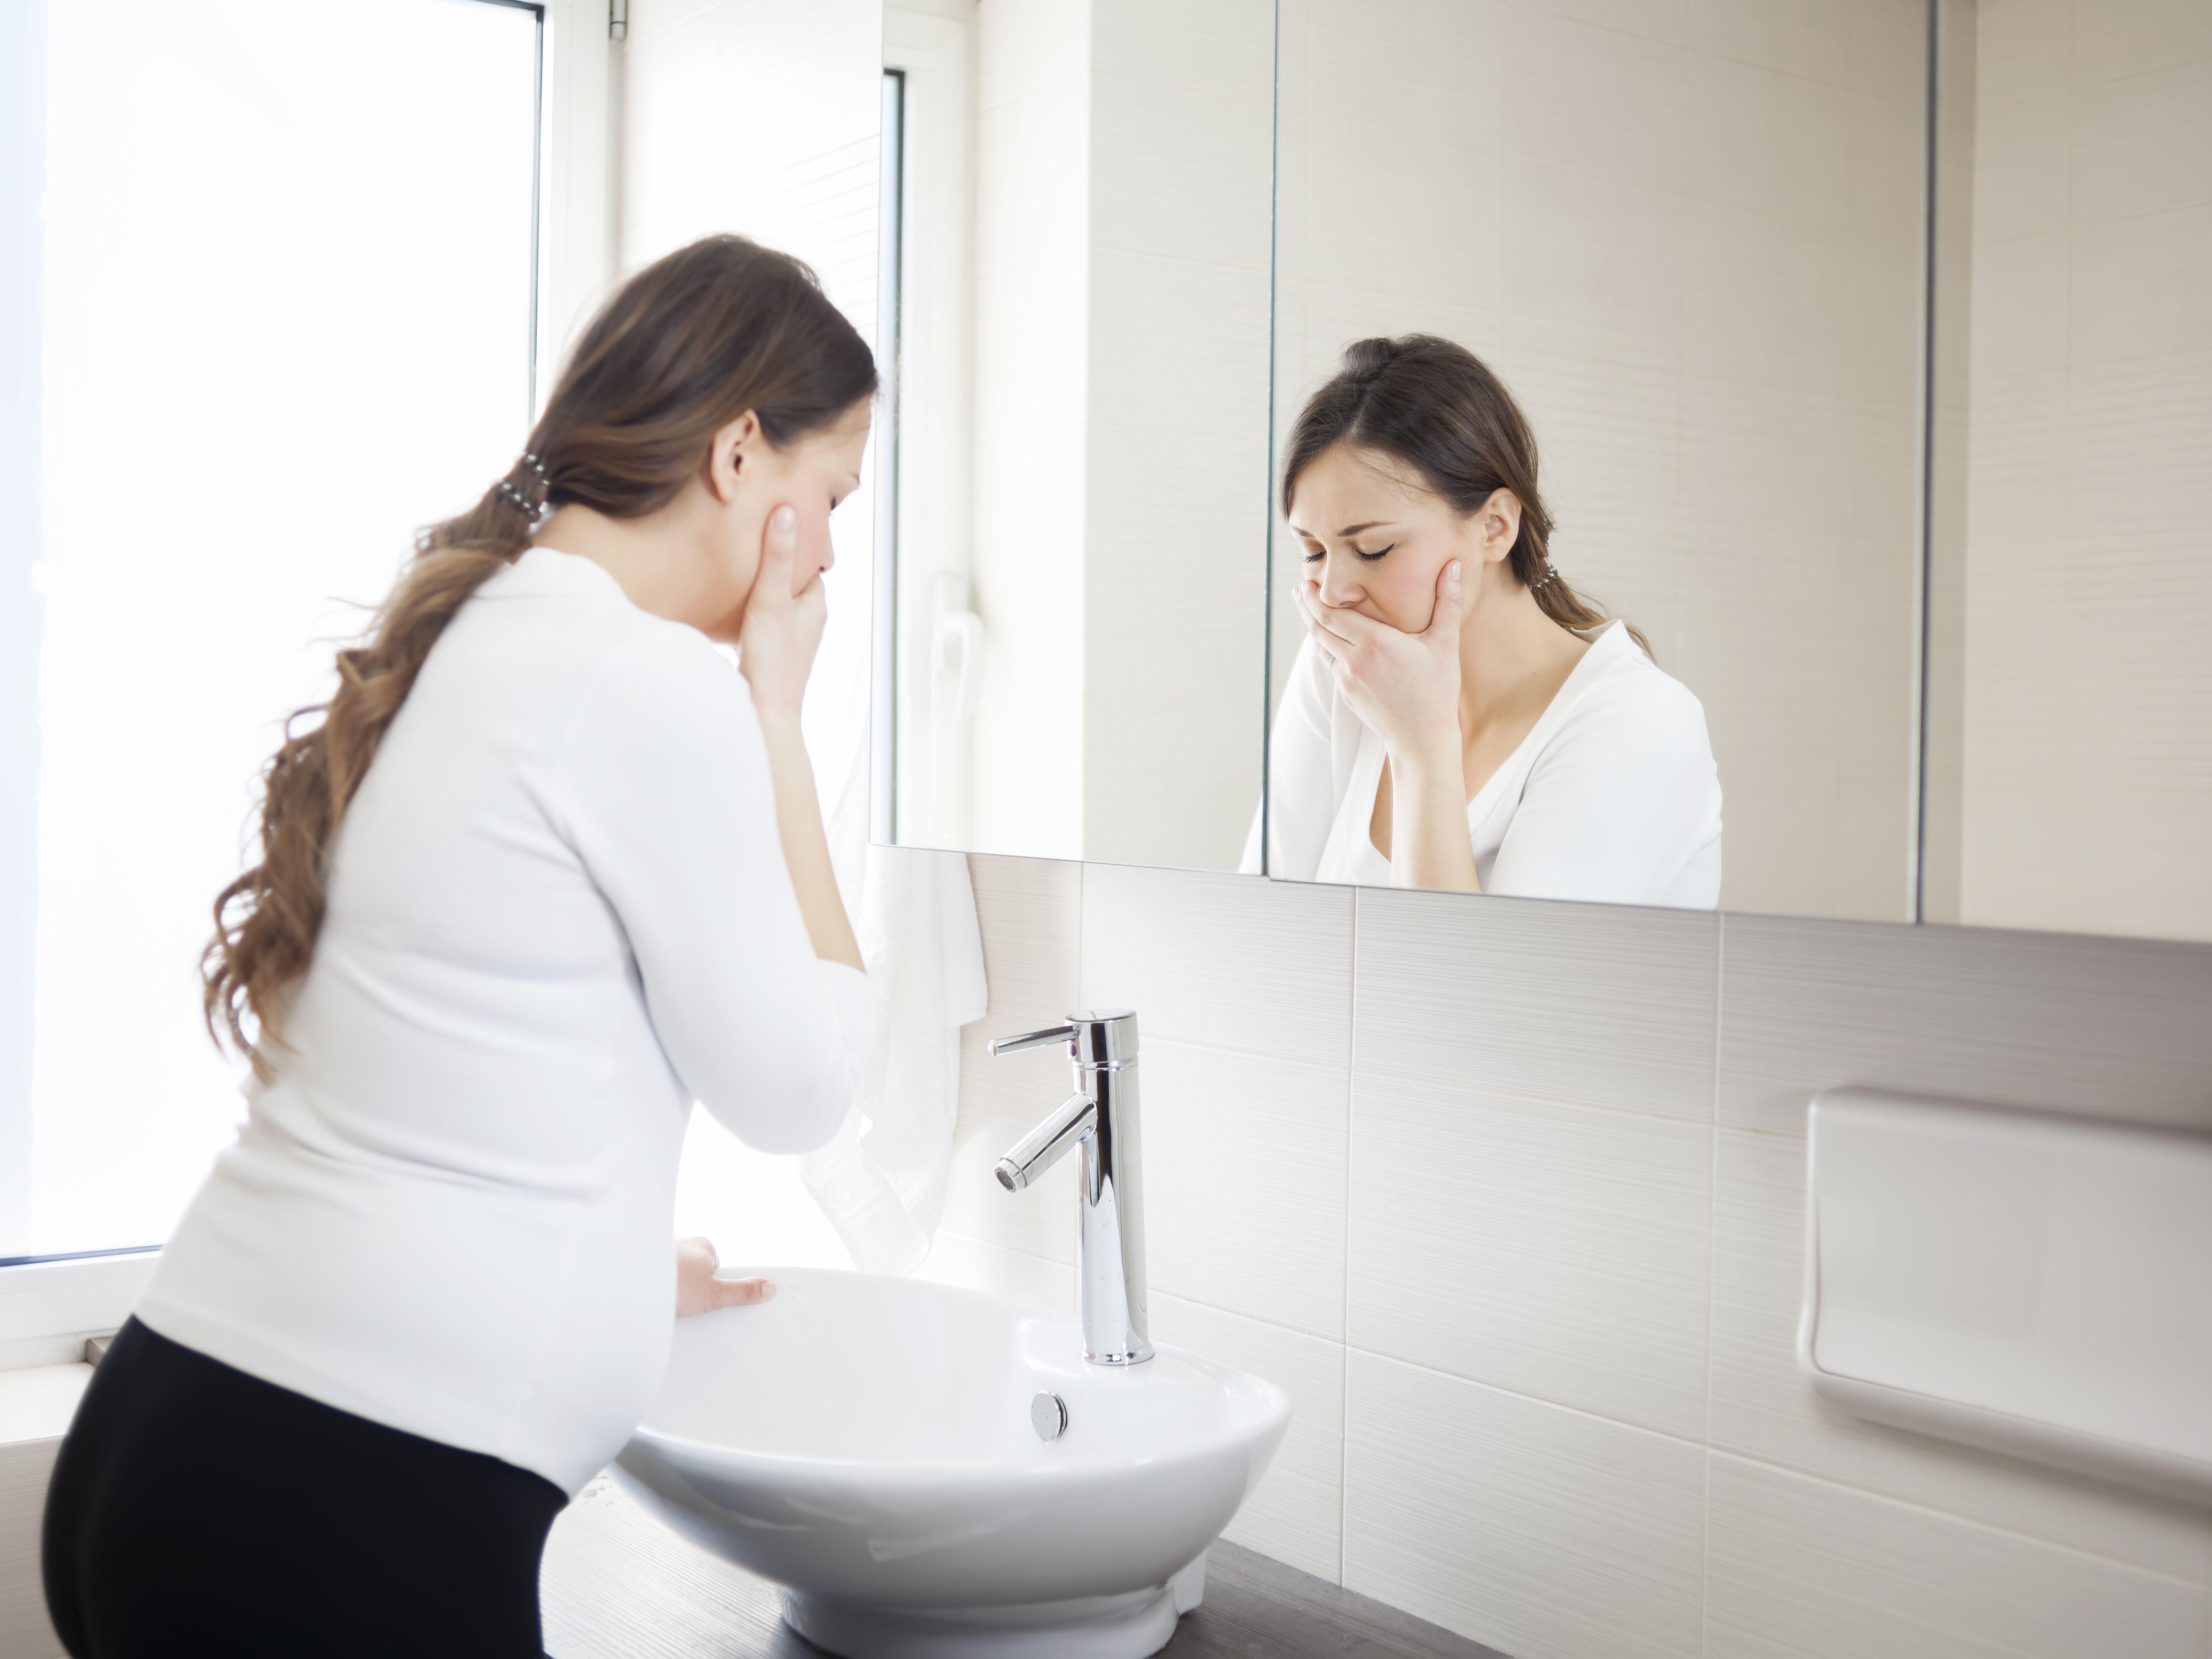 Severe Morning Sickness or Hyperemesis Gravidarum